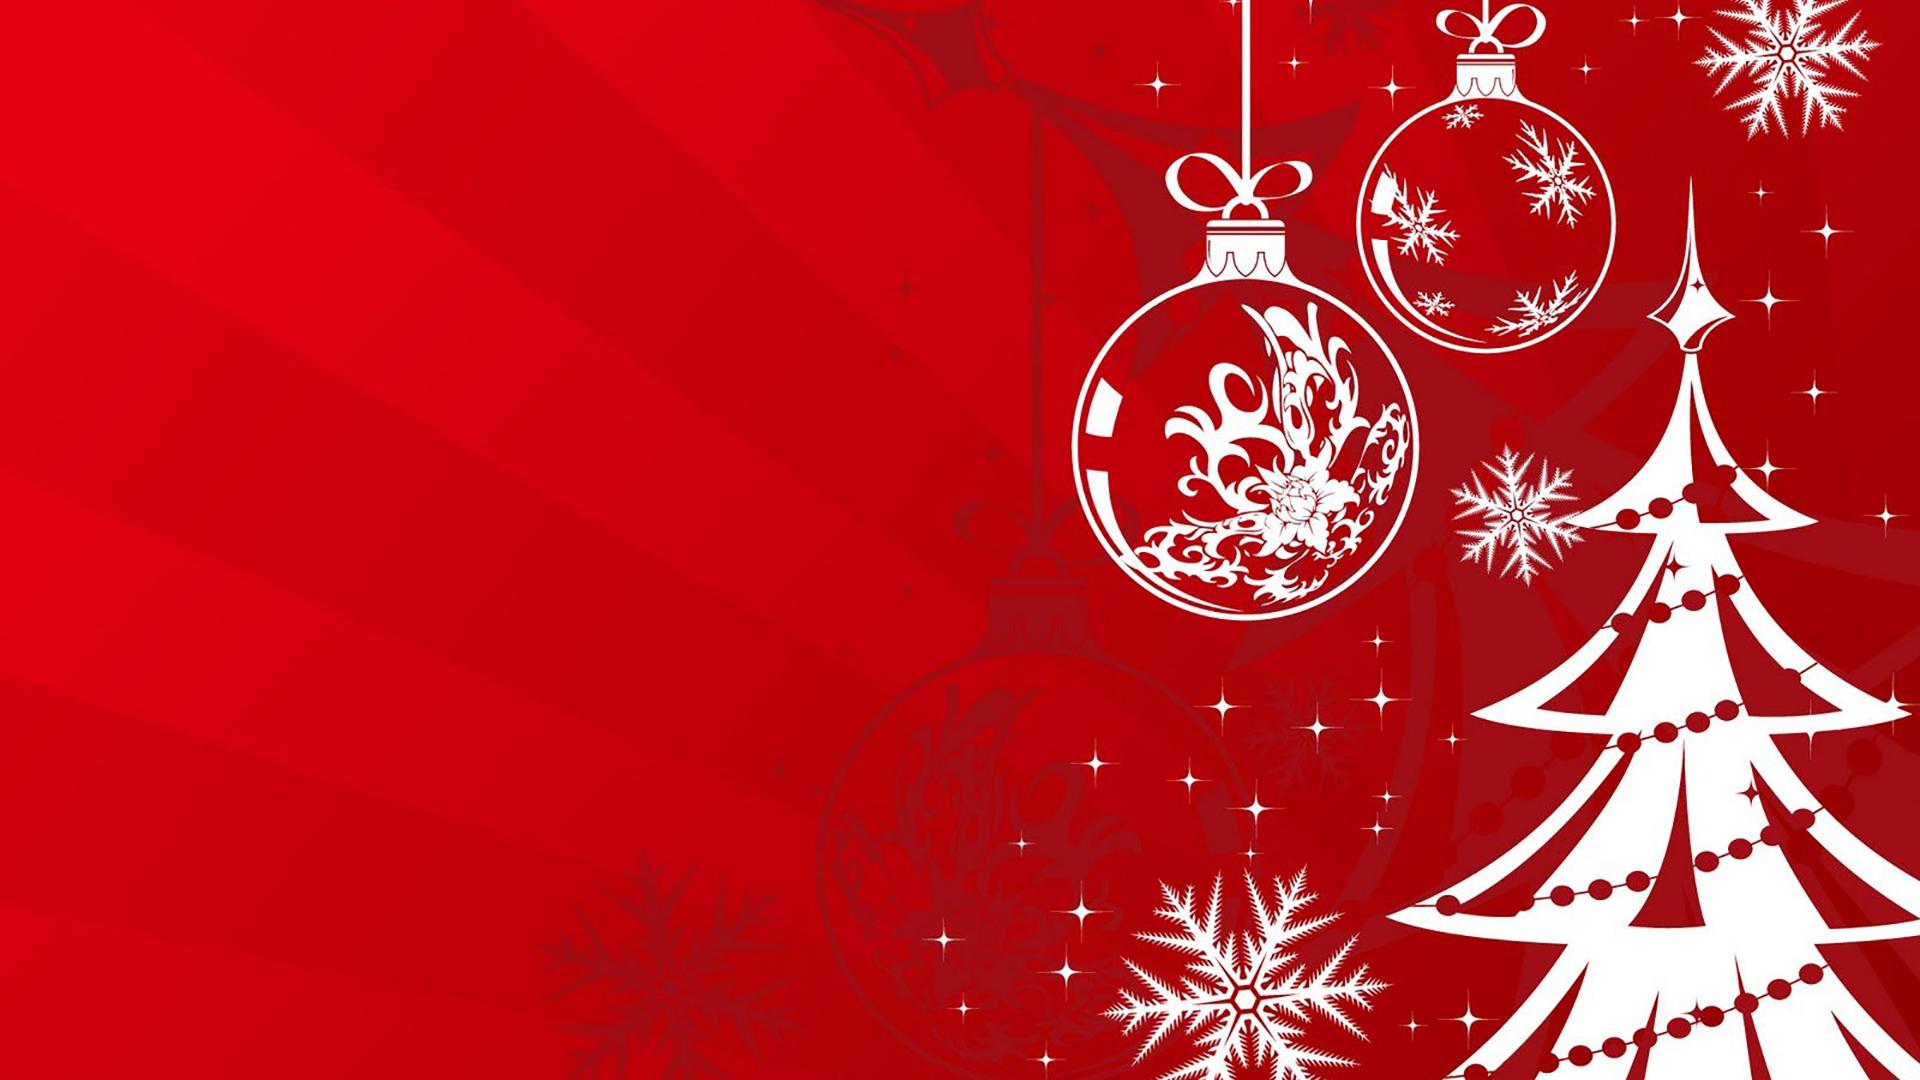 DEC 25 Christmas Graphic For Digital Signage